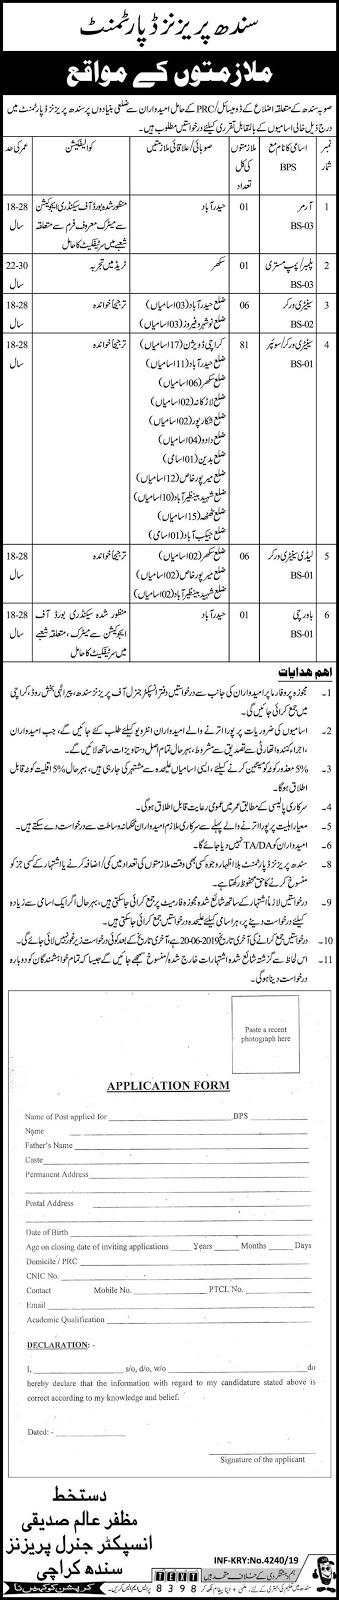 Prisons Department Jobs 2019 August | Govt of Sindh